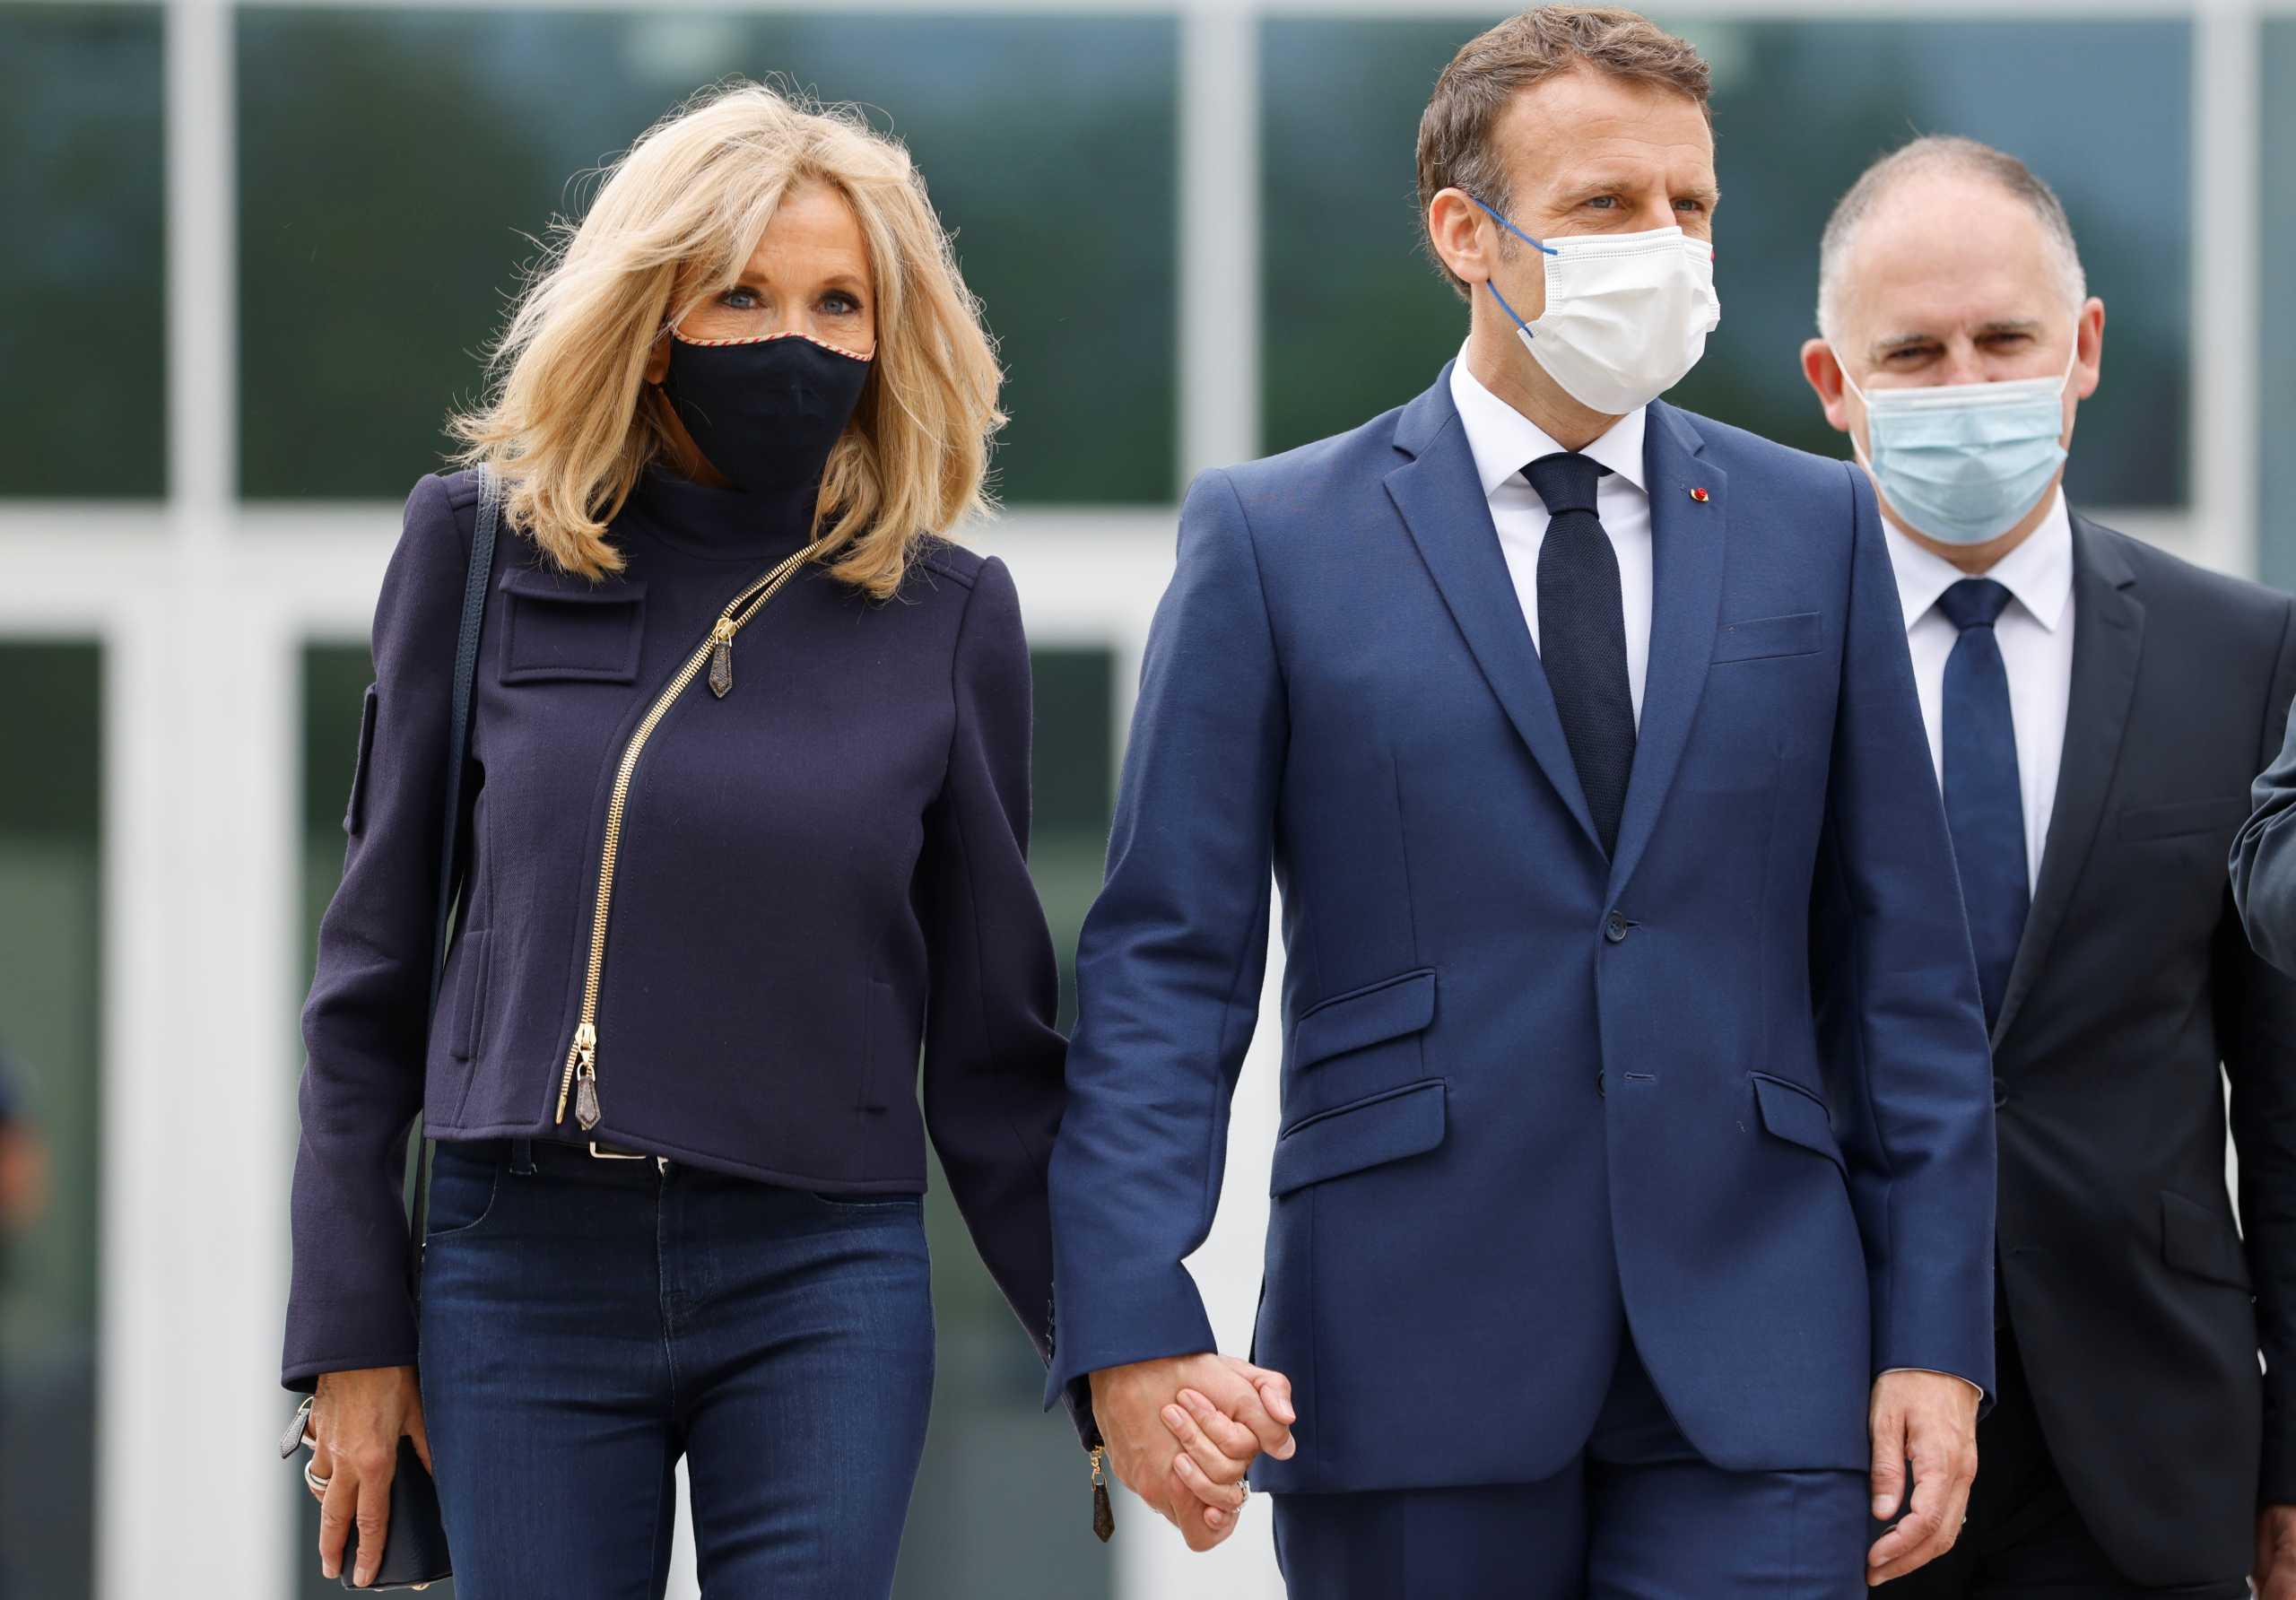 Euromed 9: Η φωτογραφία από την ιδιωτική επίσκεψη του ζεύγους Μακρόν στην Ακρόπολη